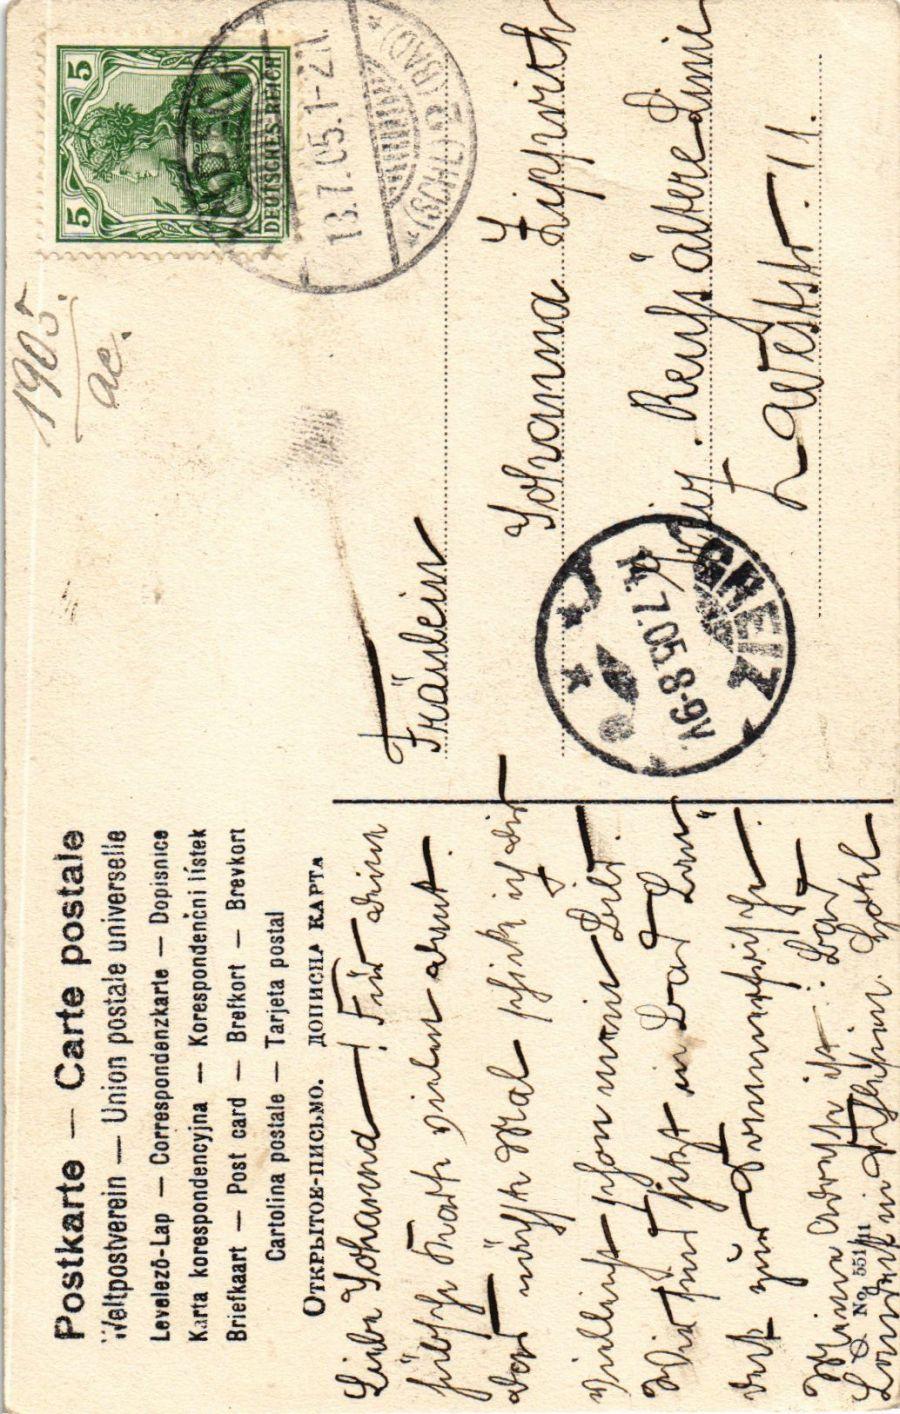 CPA-AK-Prinzessin-Viktoria-Luise-v-Preussen-GERMAN-ROYALTY-867900 Indexbild 2